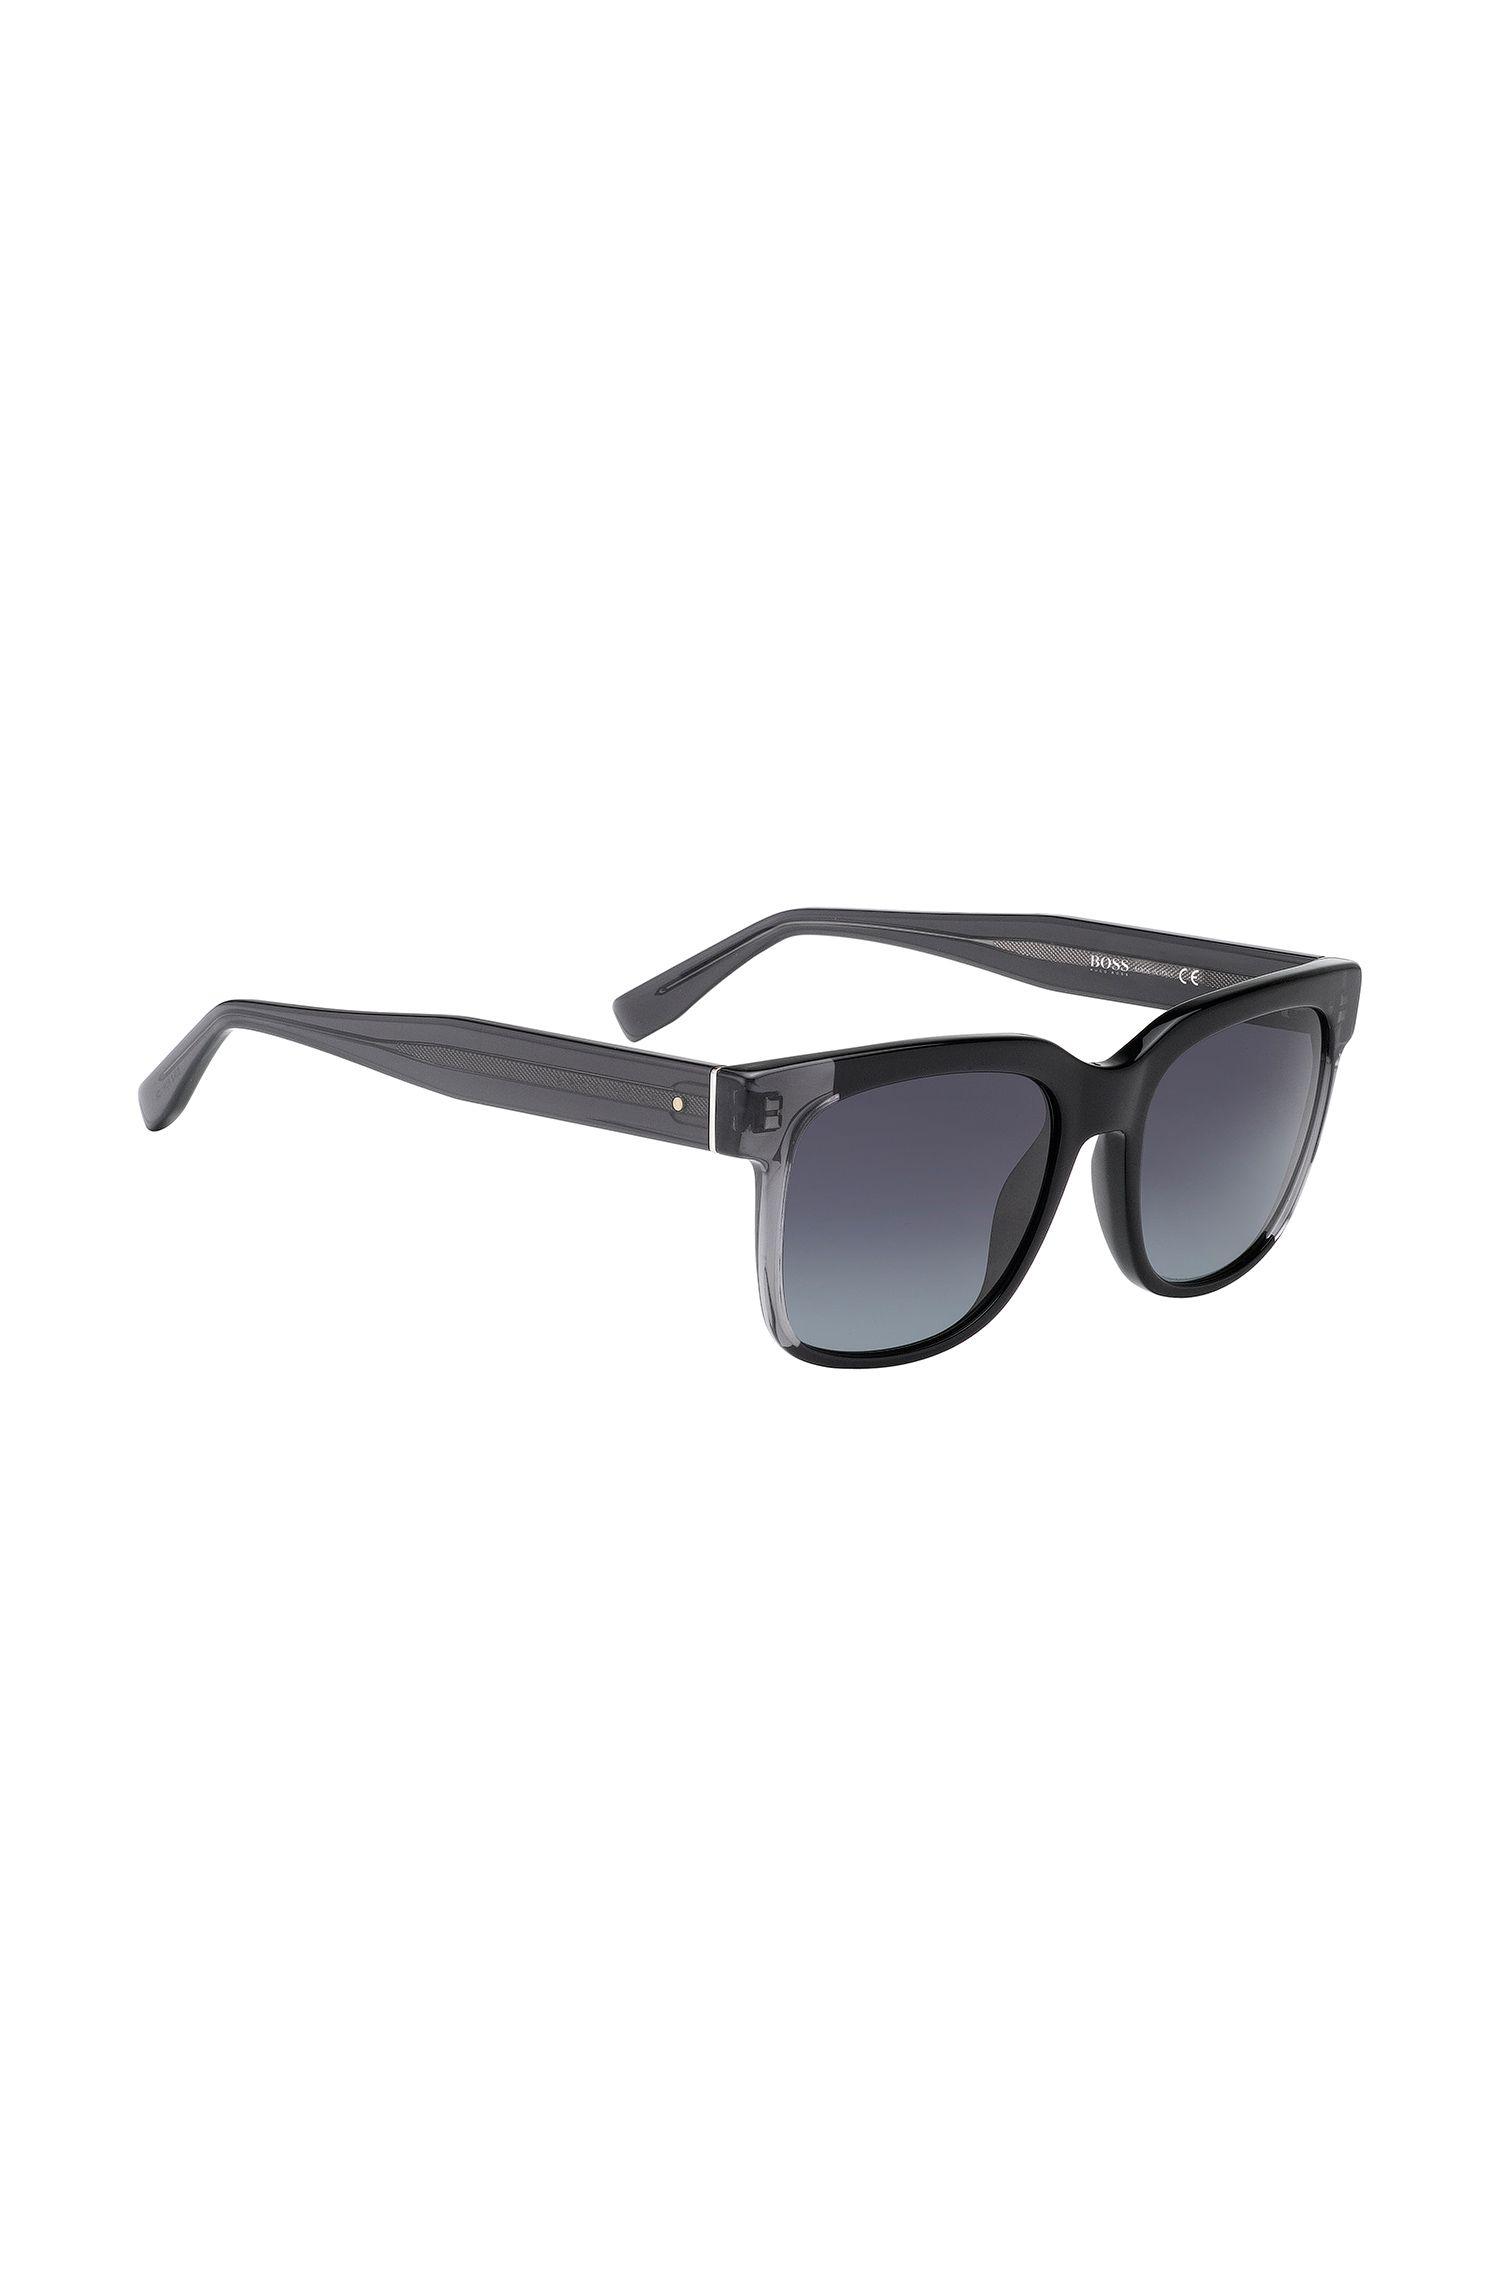 Sonnenbrille: 'BOSS 0735/S'